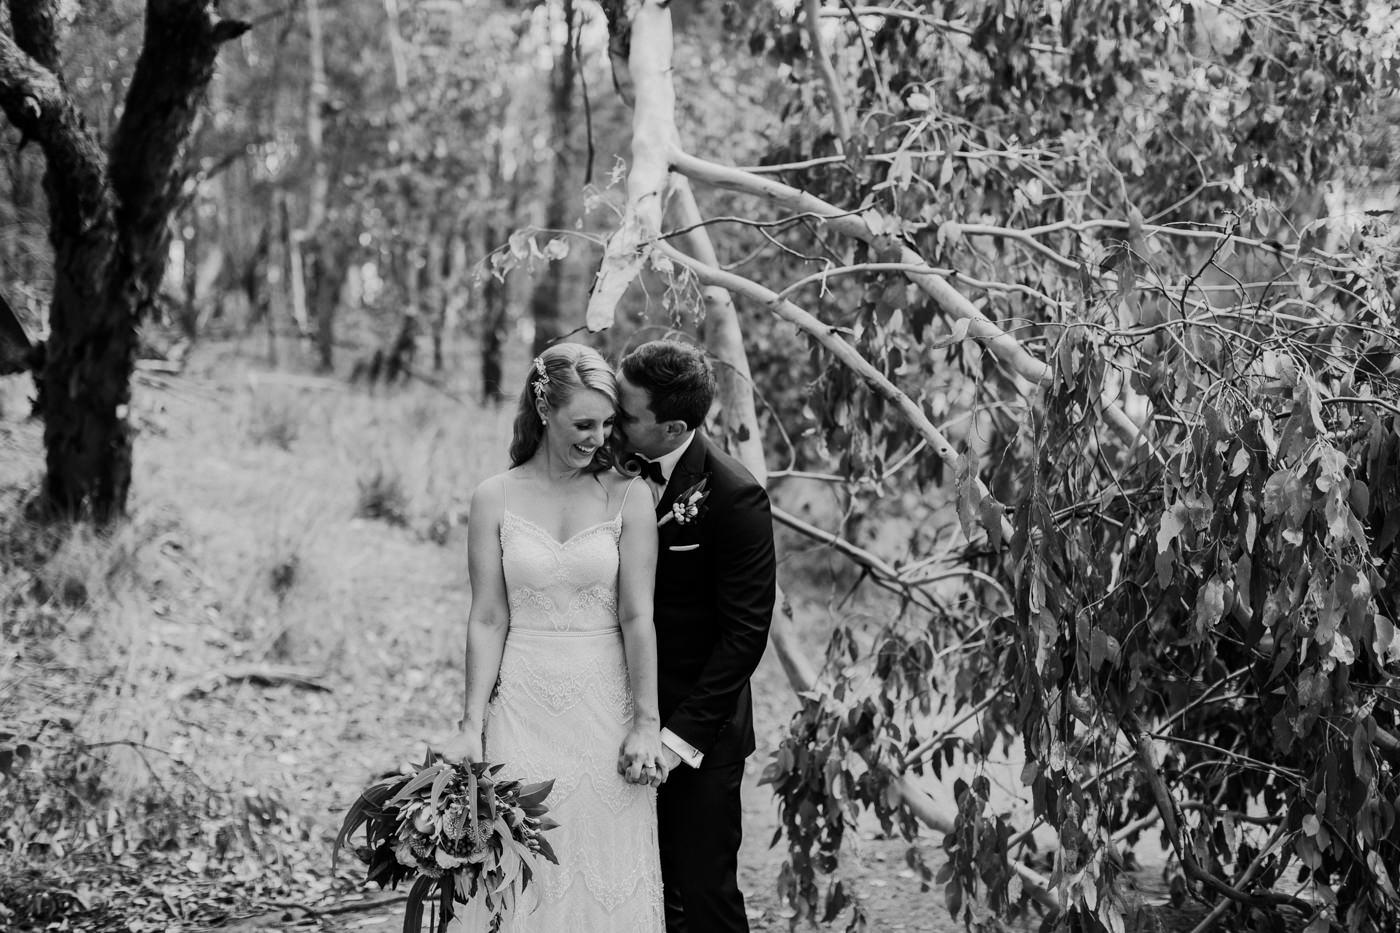 Anthony & Eliet - Wagga Wagga Wedding - Country NSW - Samantha Heather Photography-61.jpg